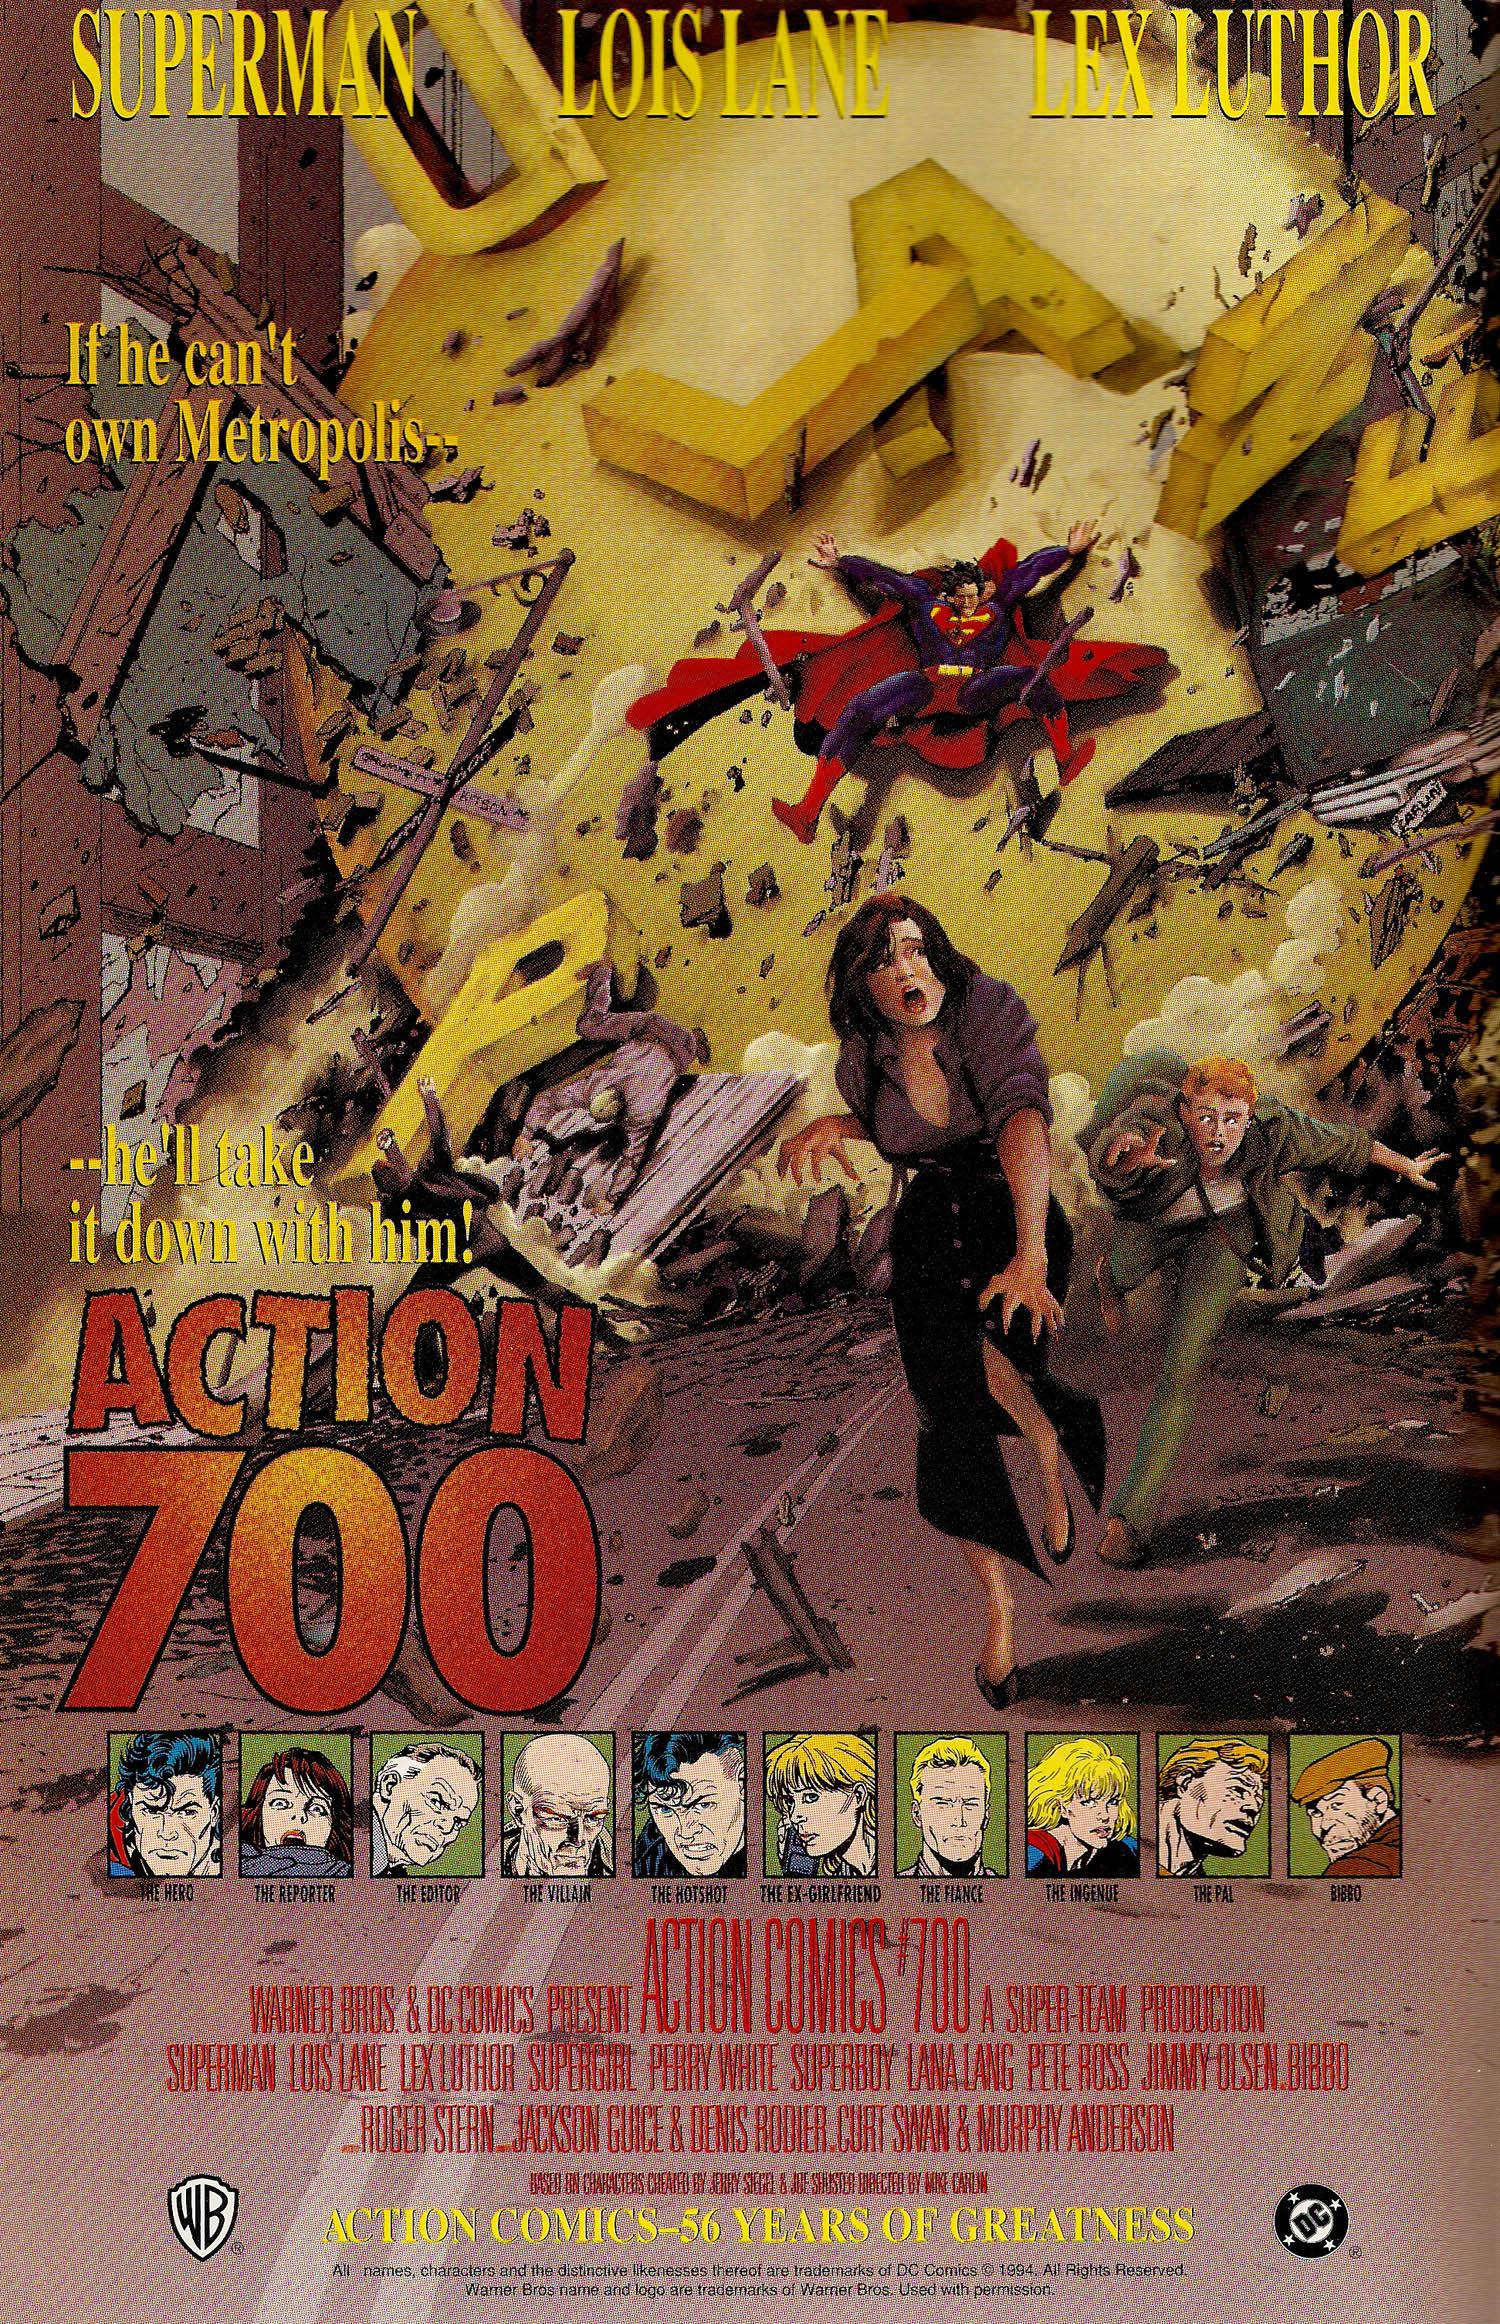 Ad-1994-Action-Comics-700